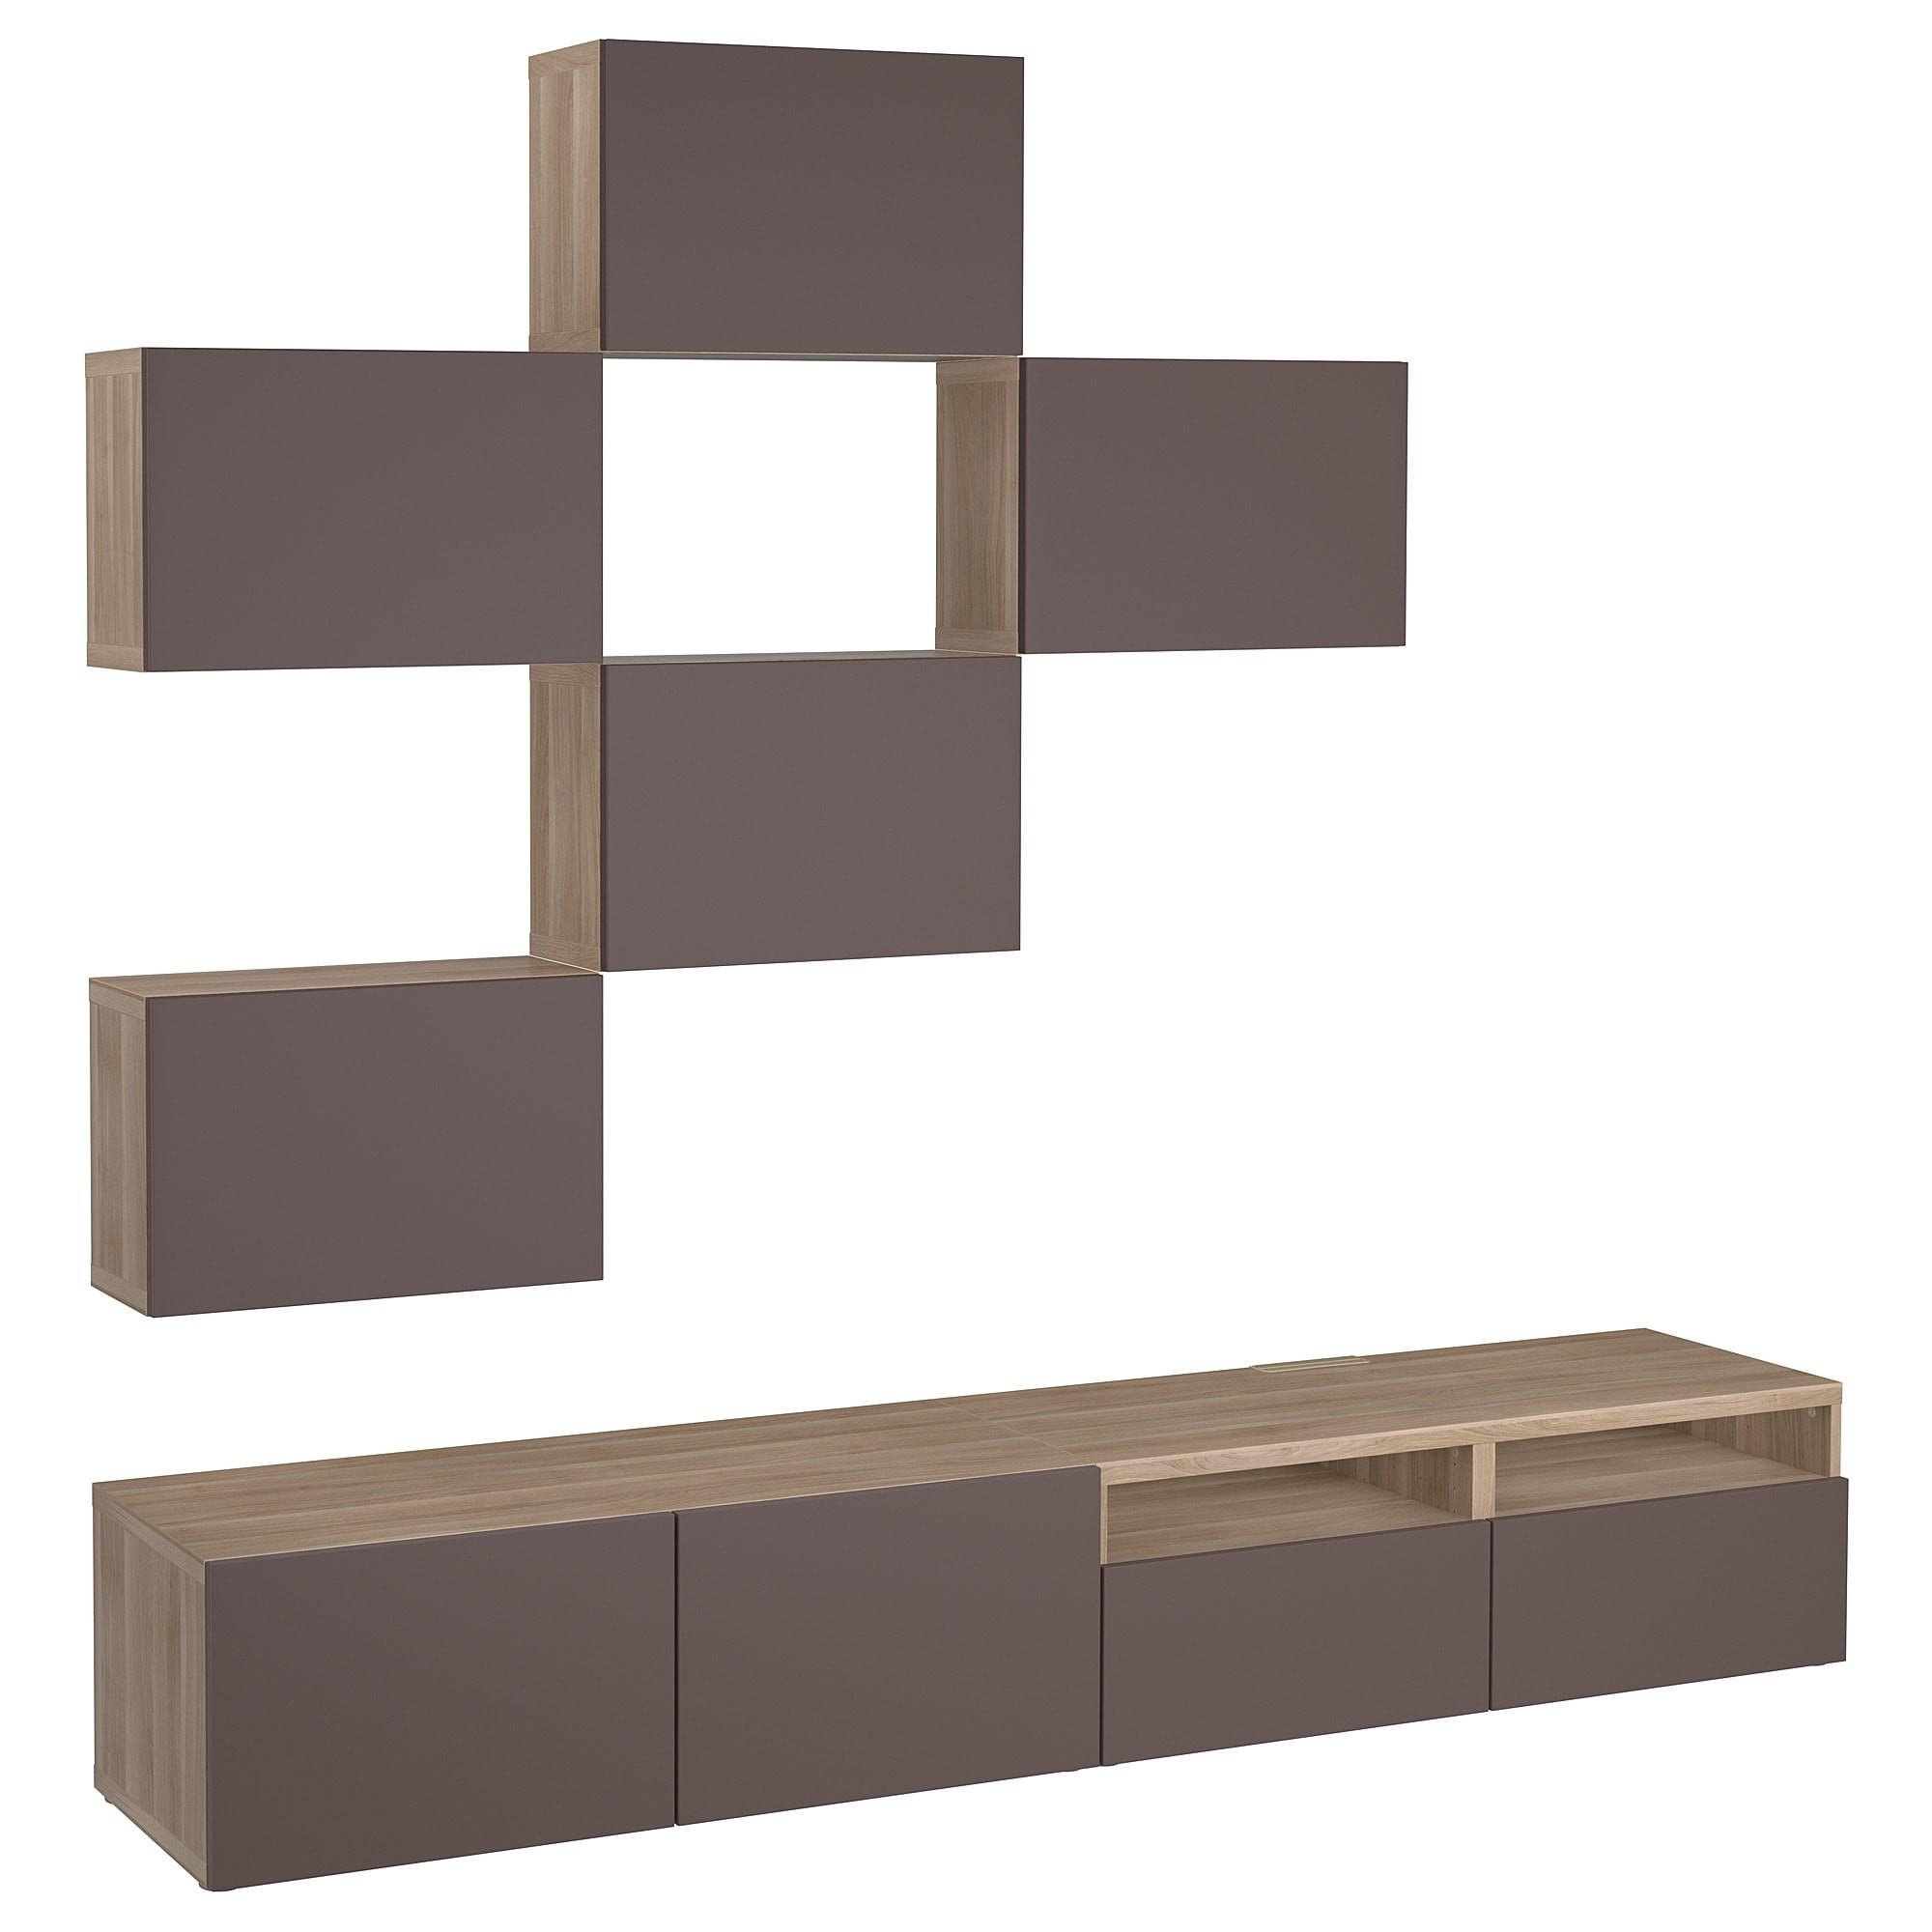 Muebles De Tv Ikea Whdr Fantastico Muebles Tv Ikea Hemnes Mueble Tv Tinte Blanco Ikea Pinterest